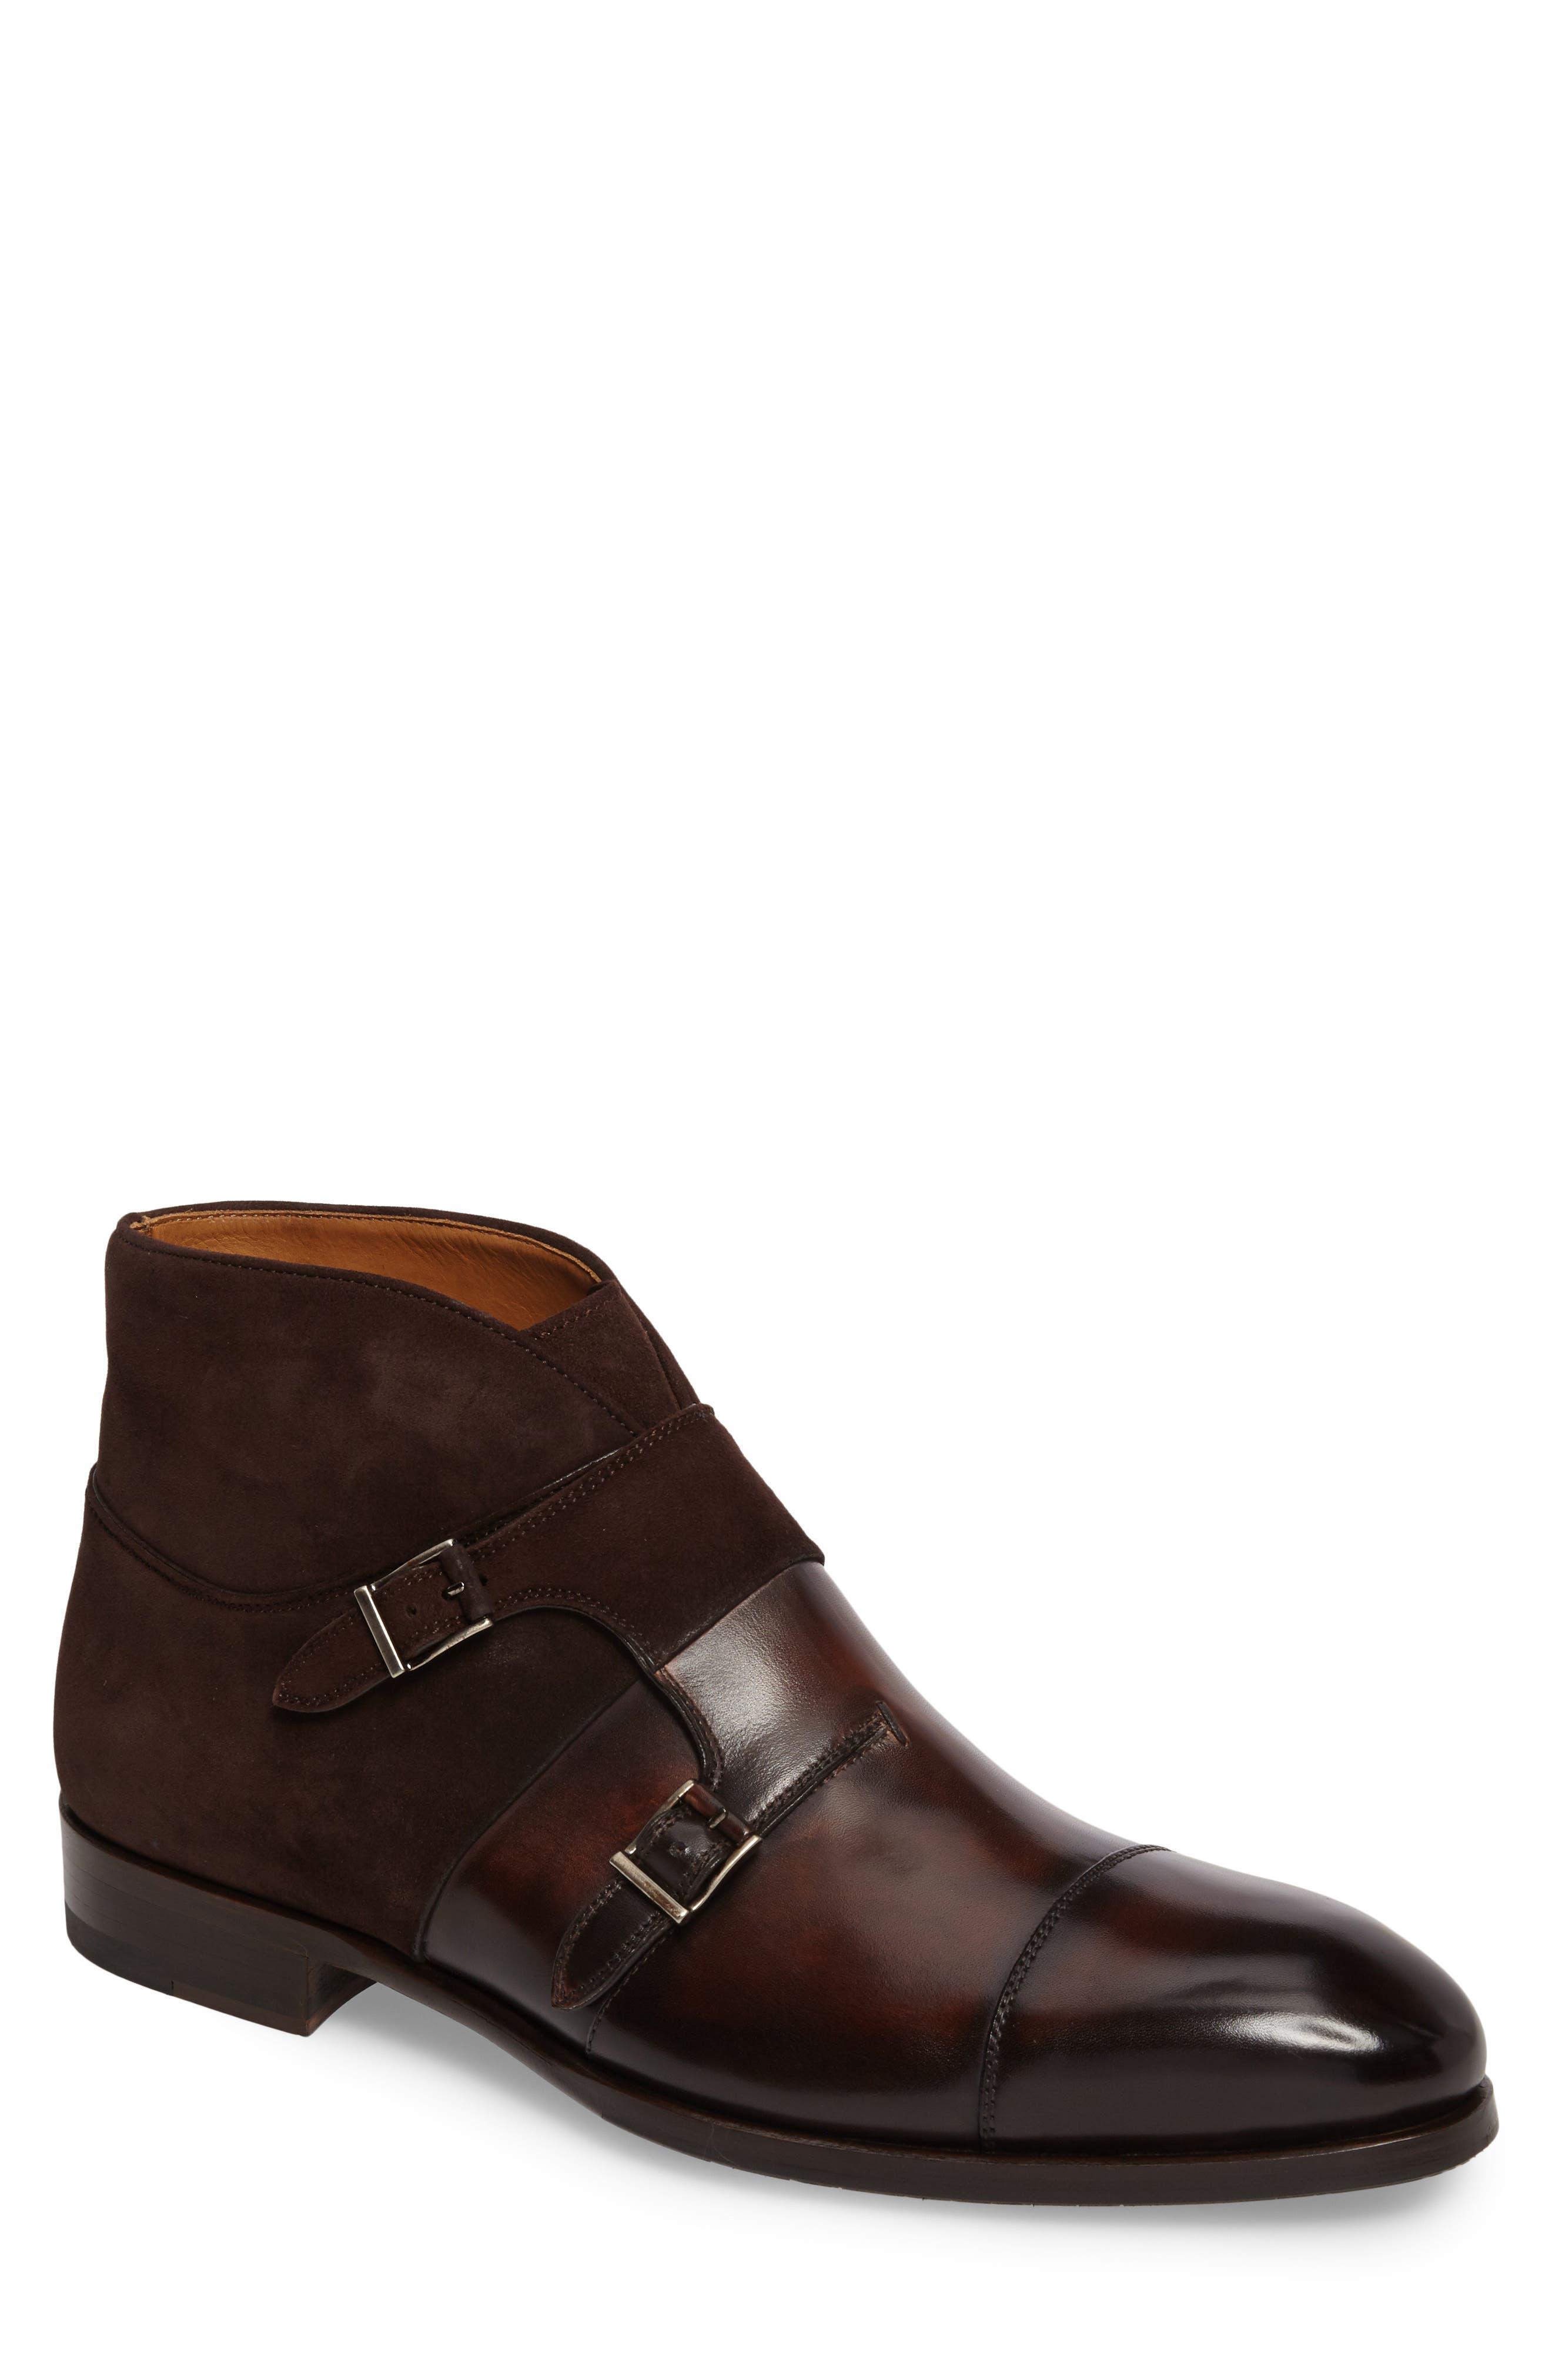 Octavian Double Monk Strap Boot,                         Main,                         color, 200